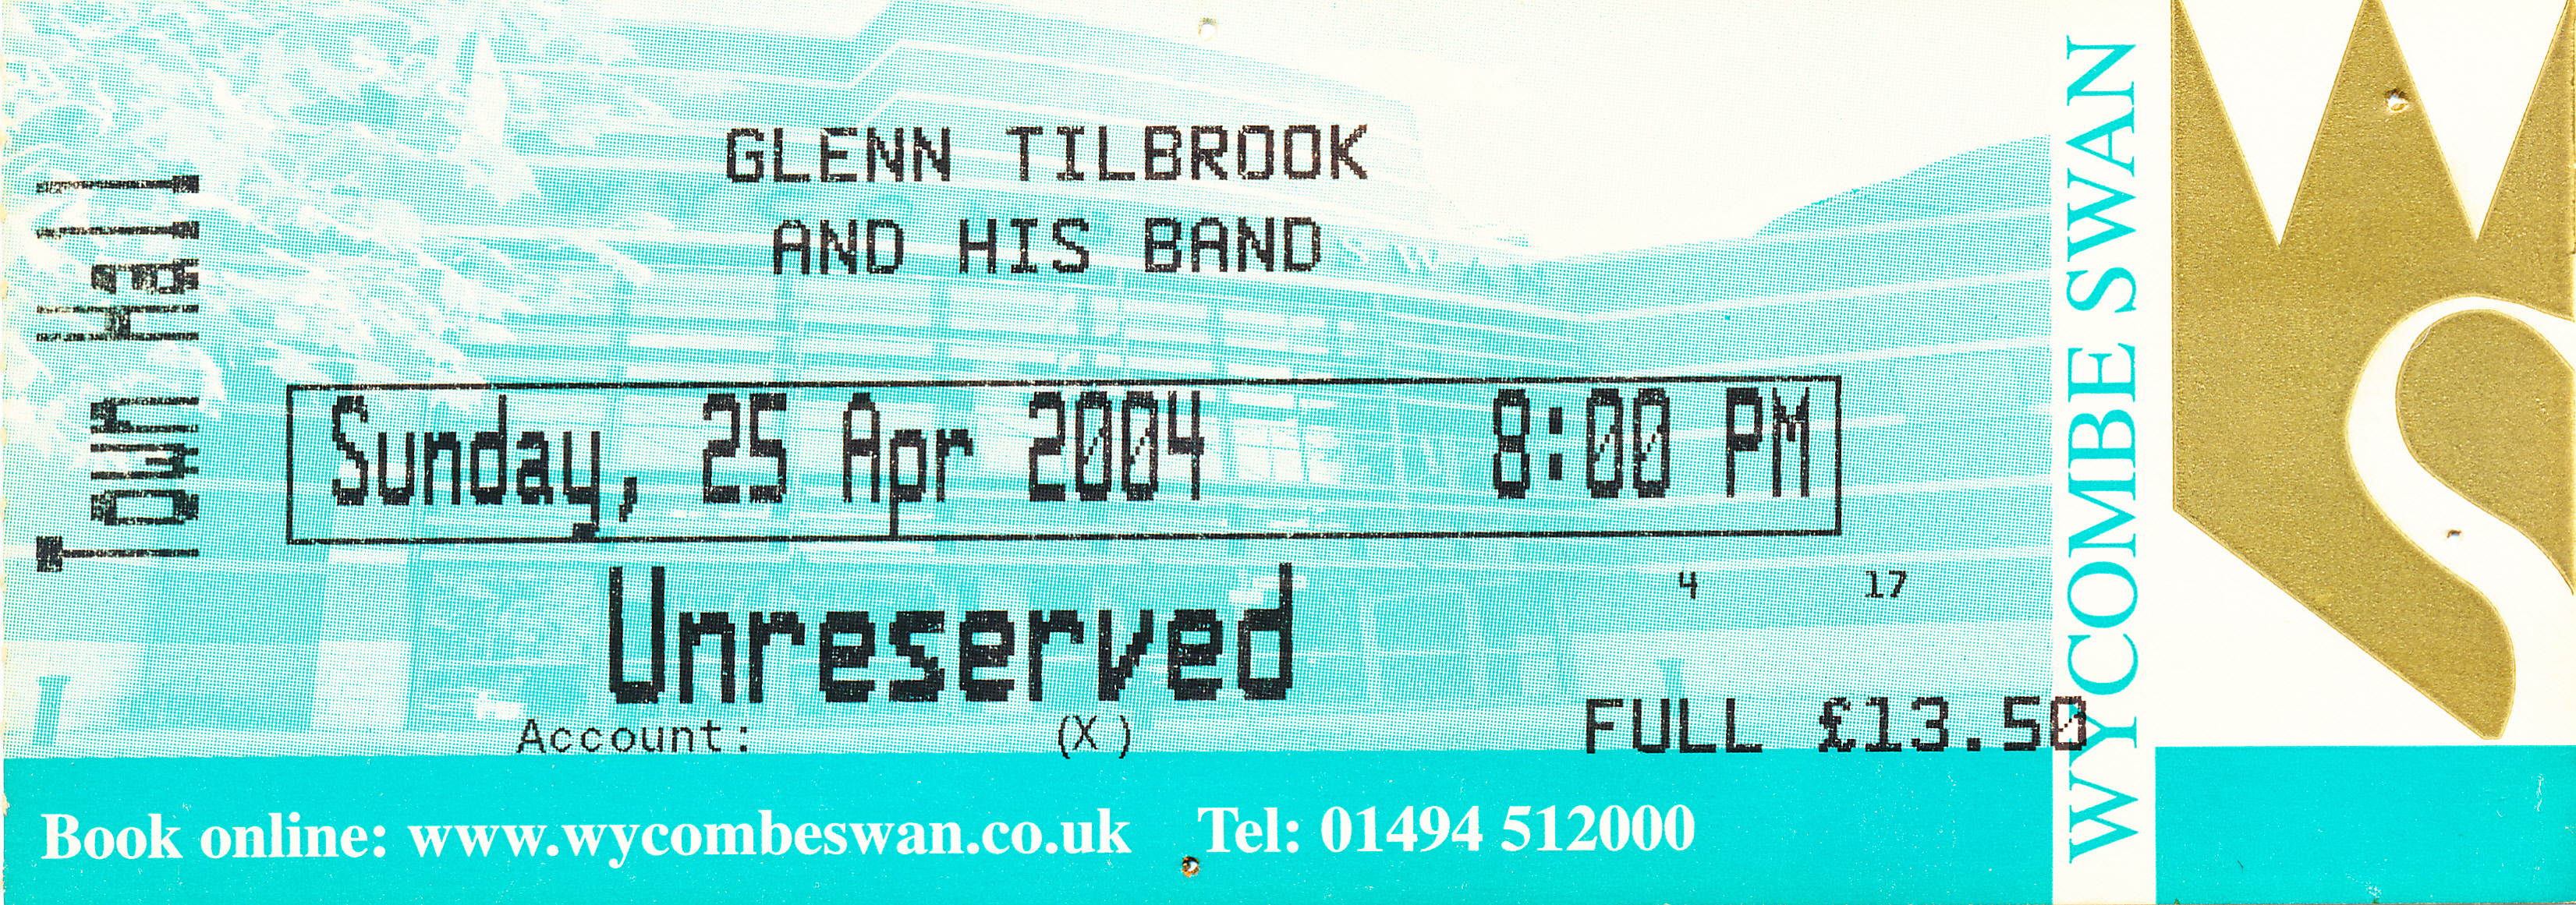 2004-04-25 ticket